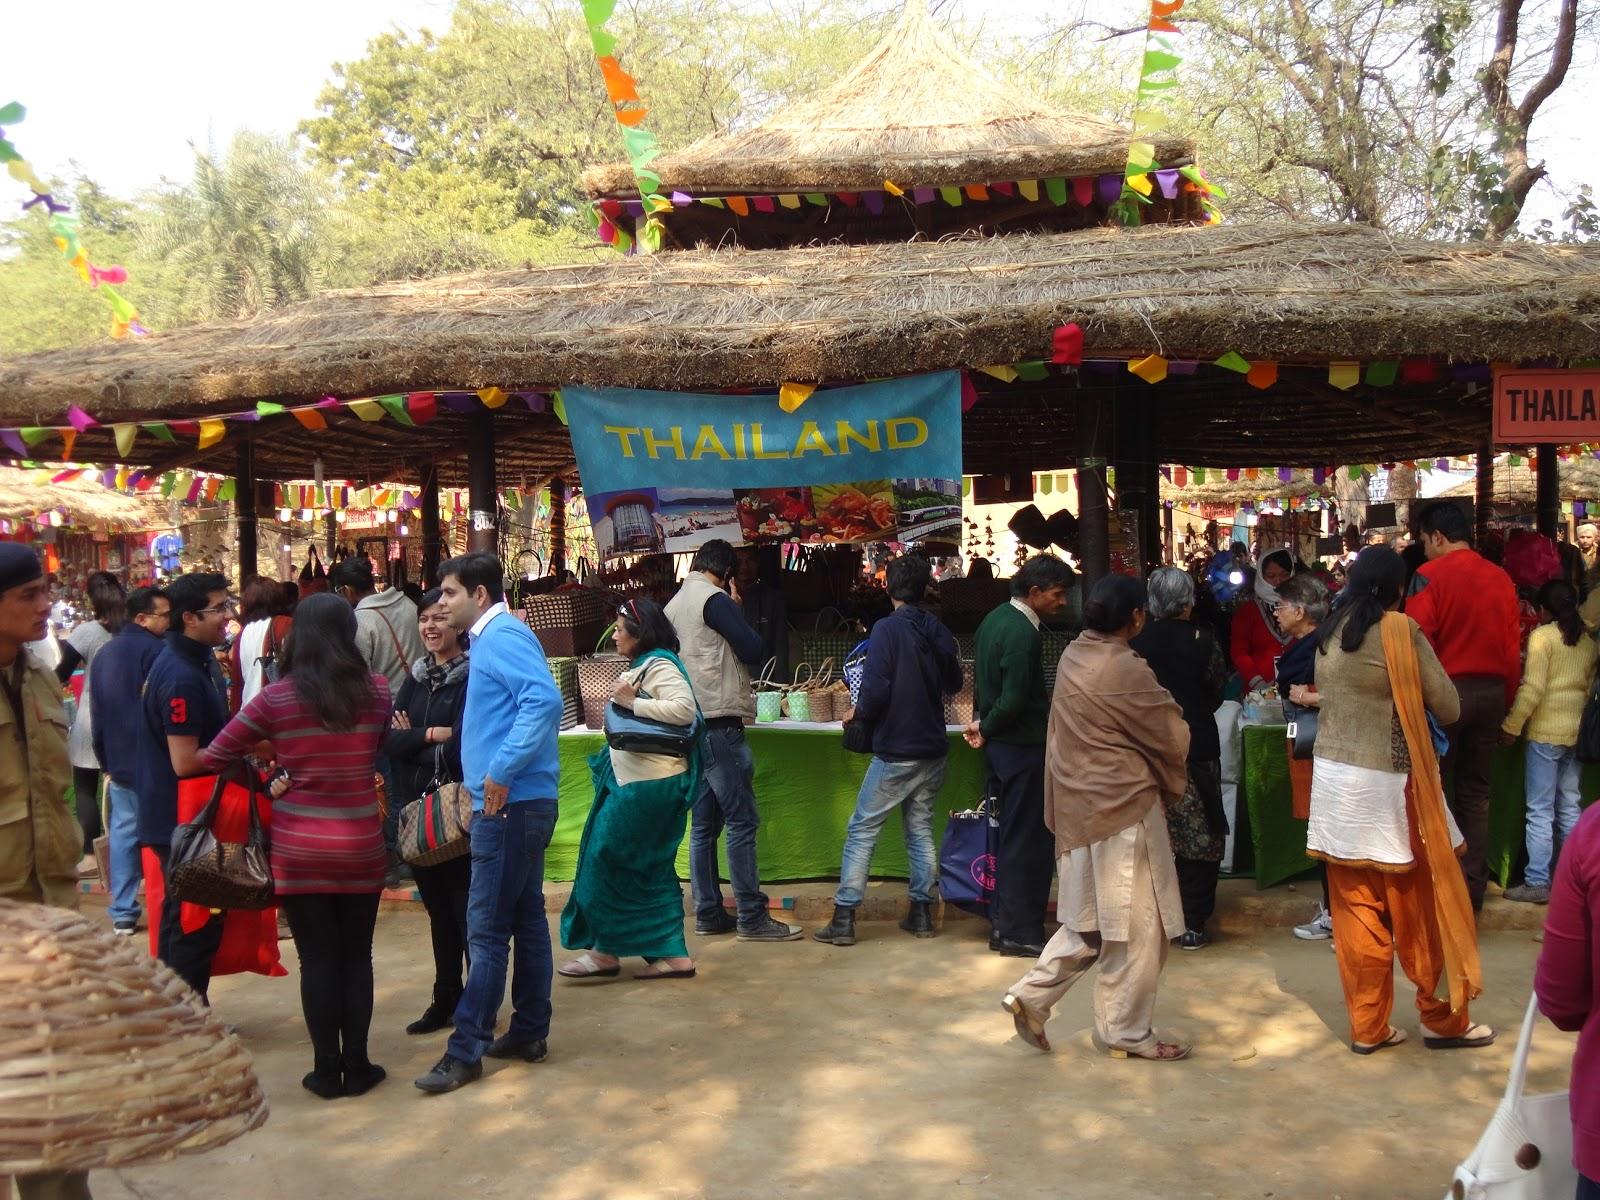 Thailand Stall at Surajkund Crafts Mela ,India